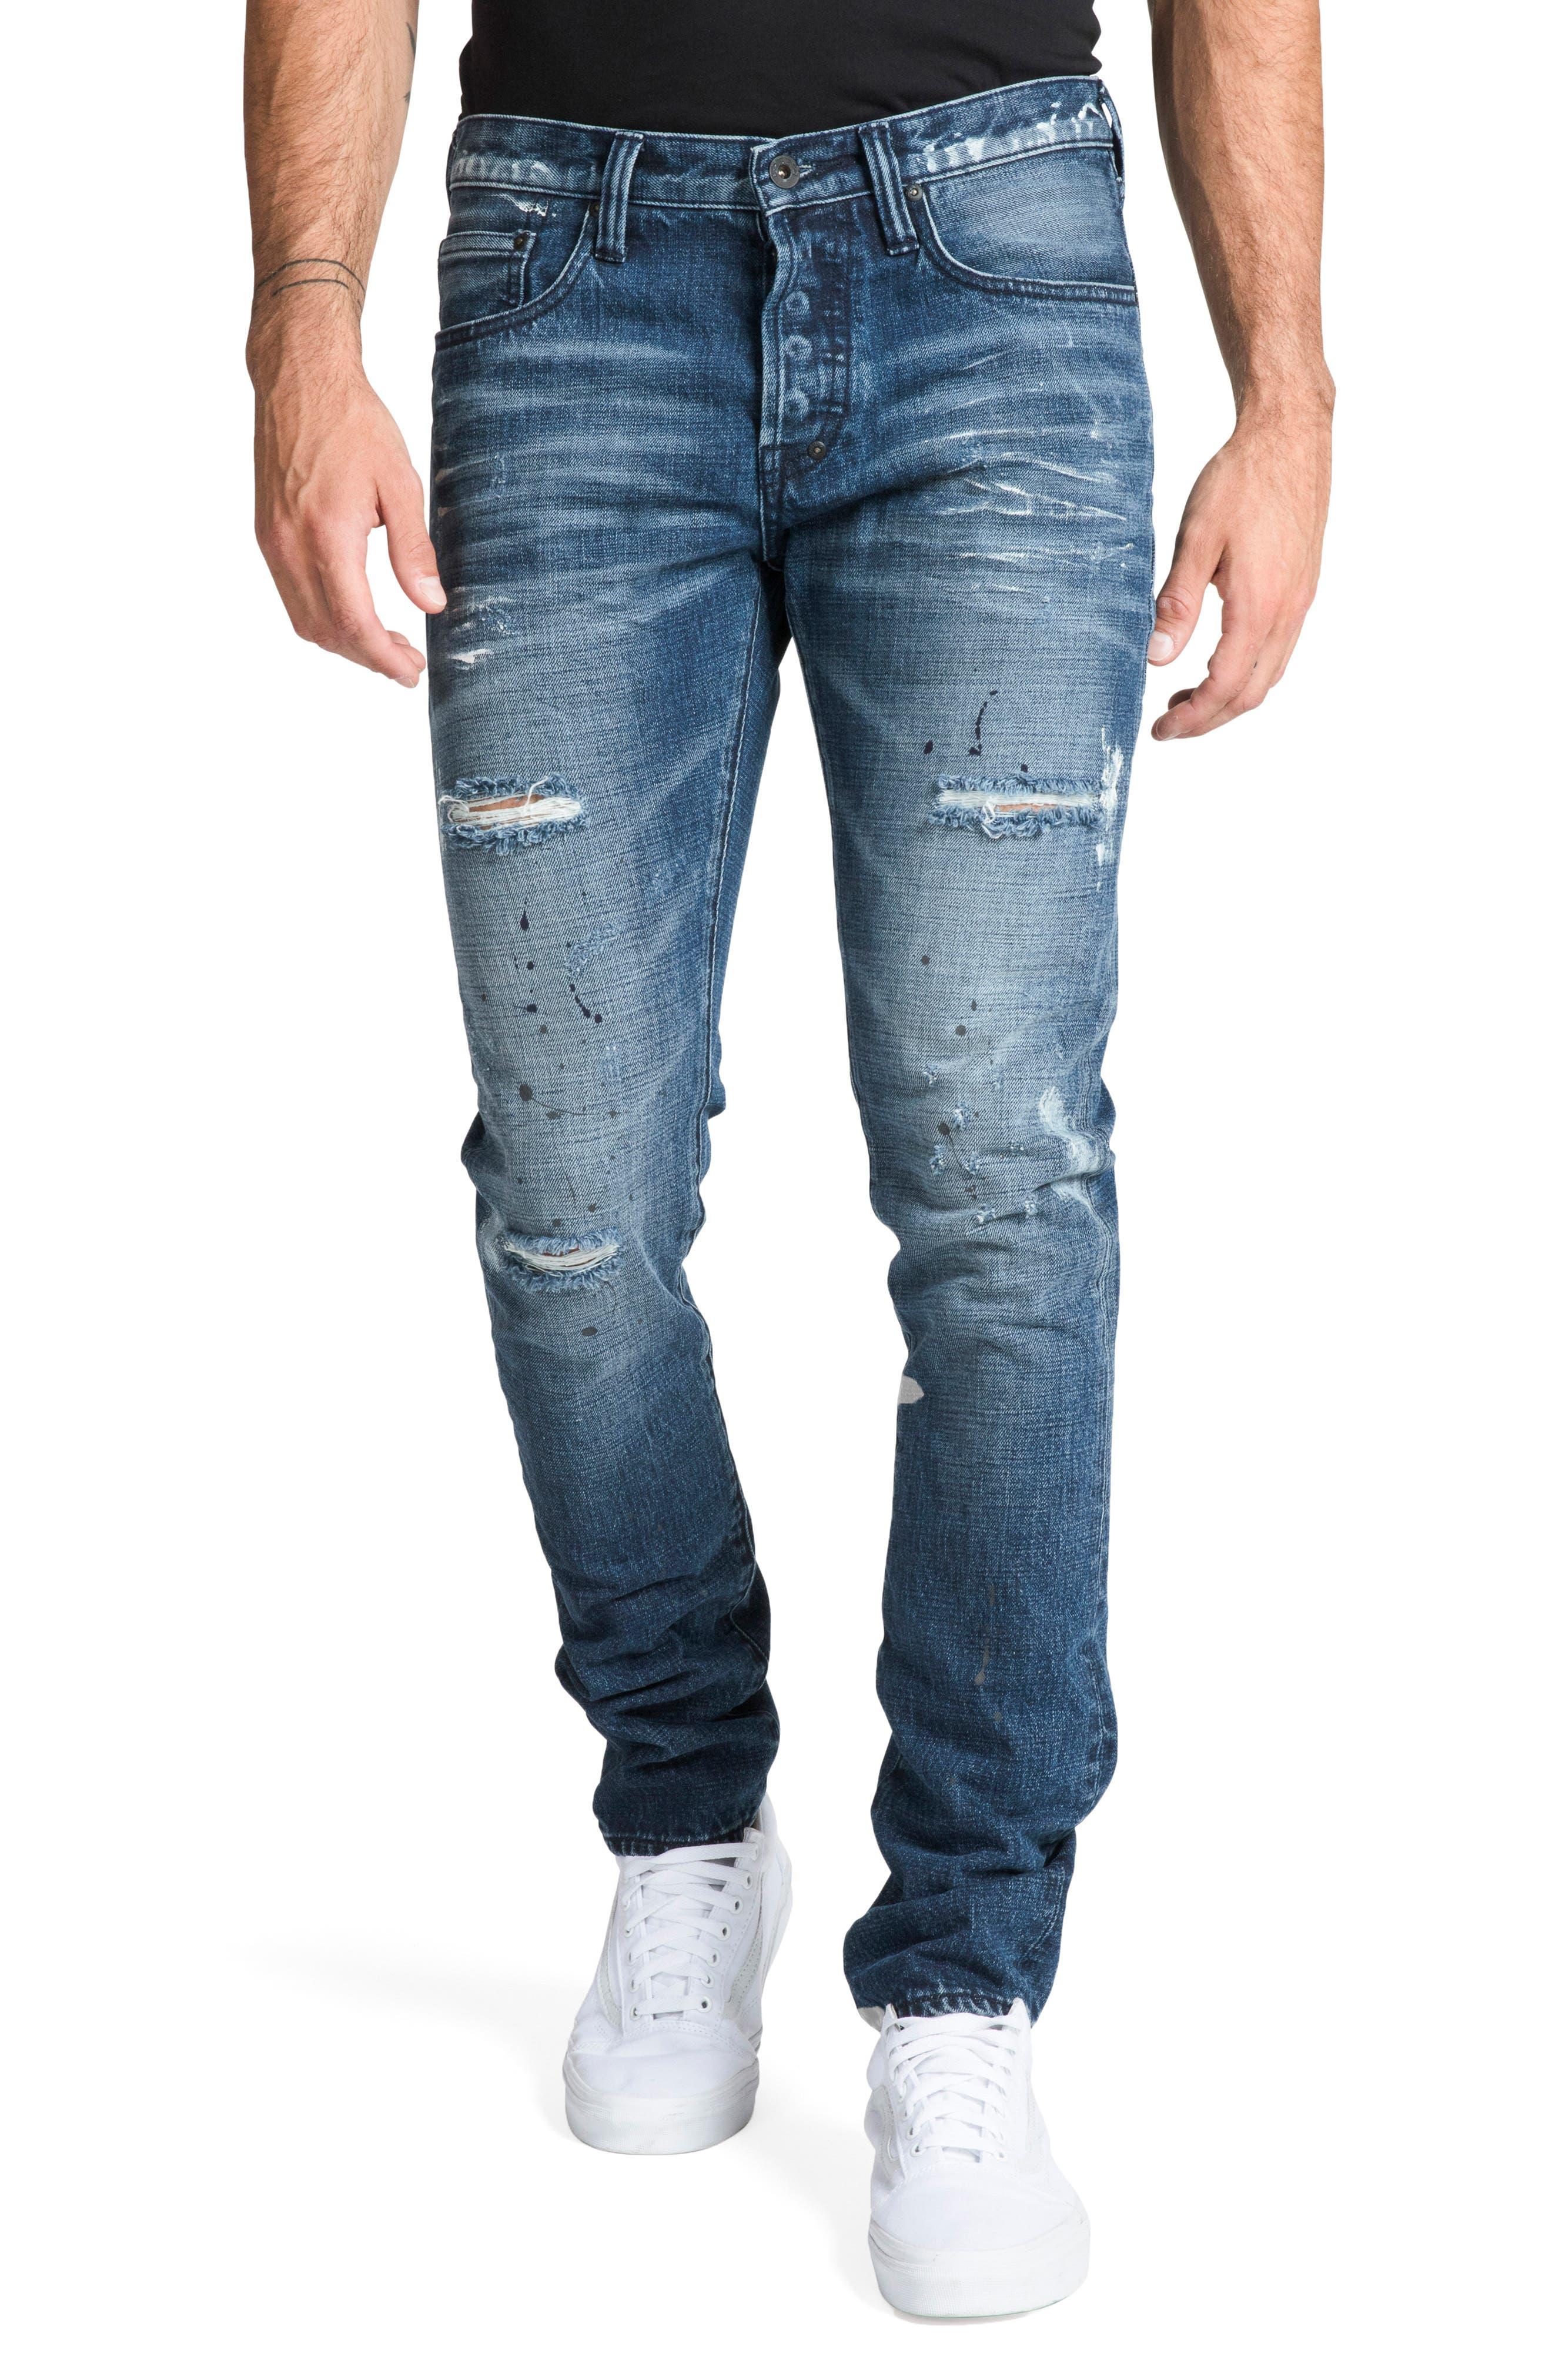 Le Sabre Slim Fit Jeans,                             Main thumbnail 1, color,                             PERPETUAL